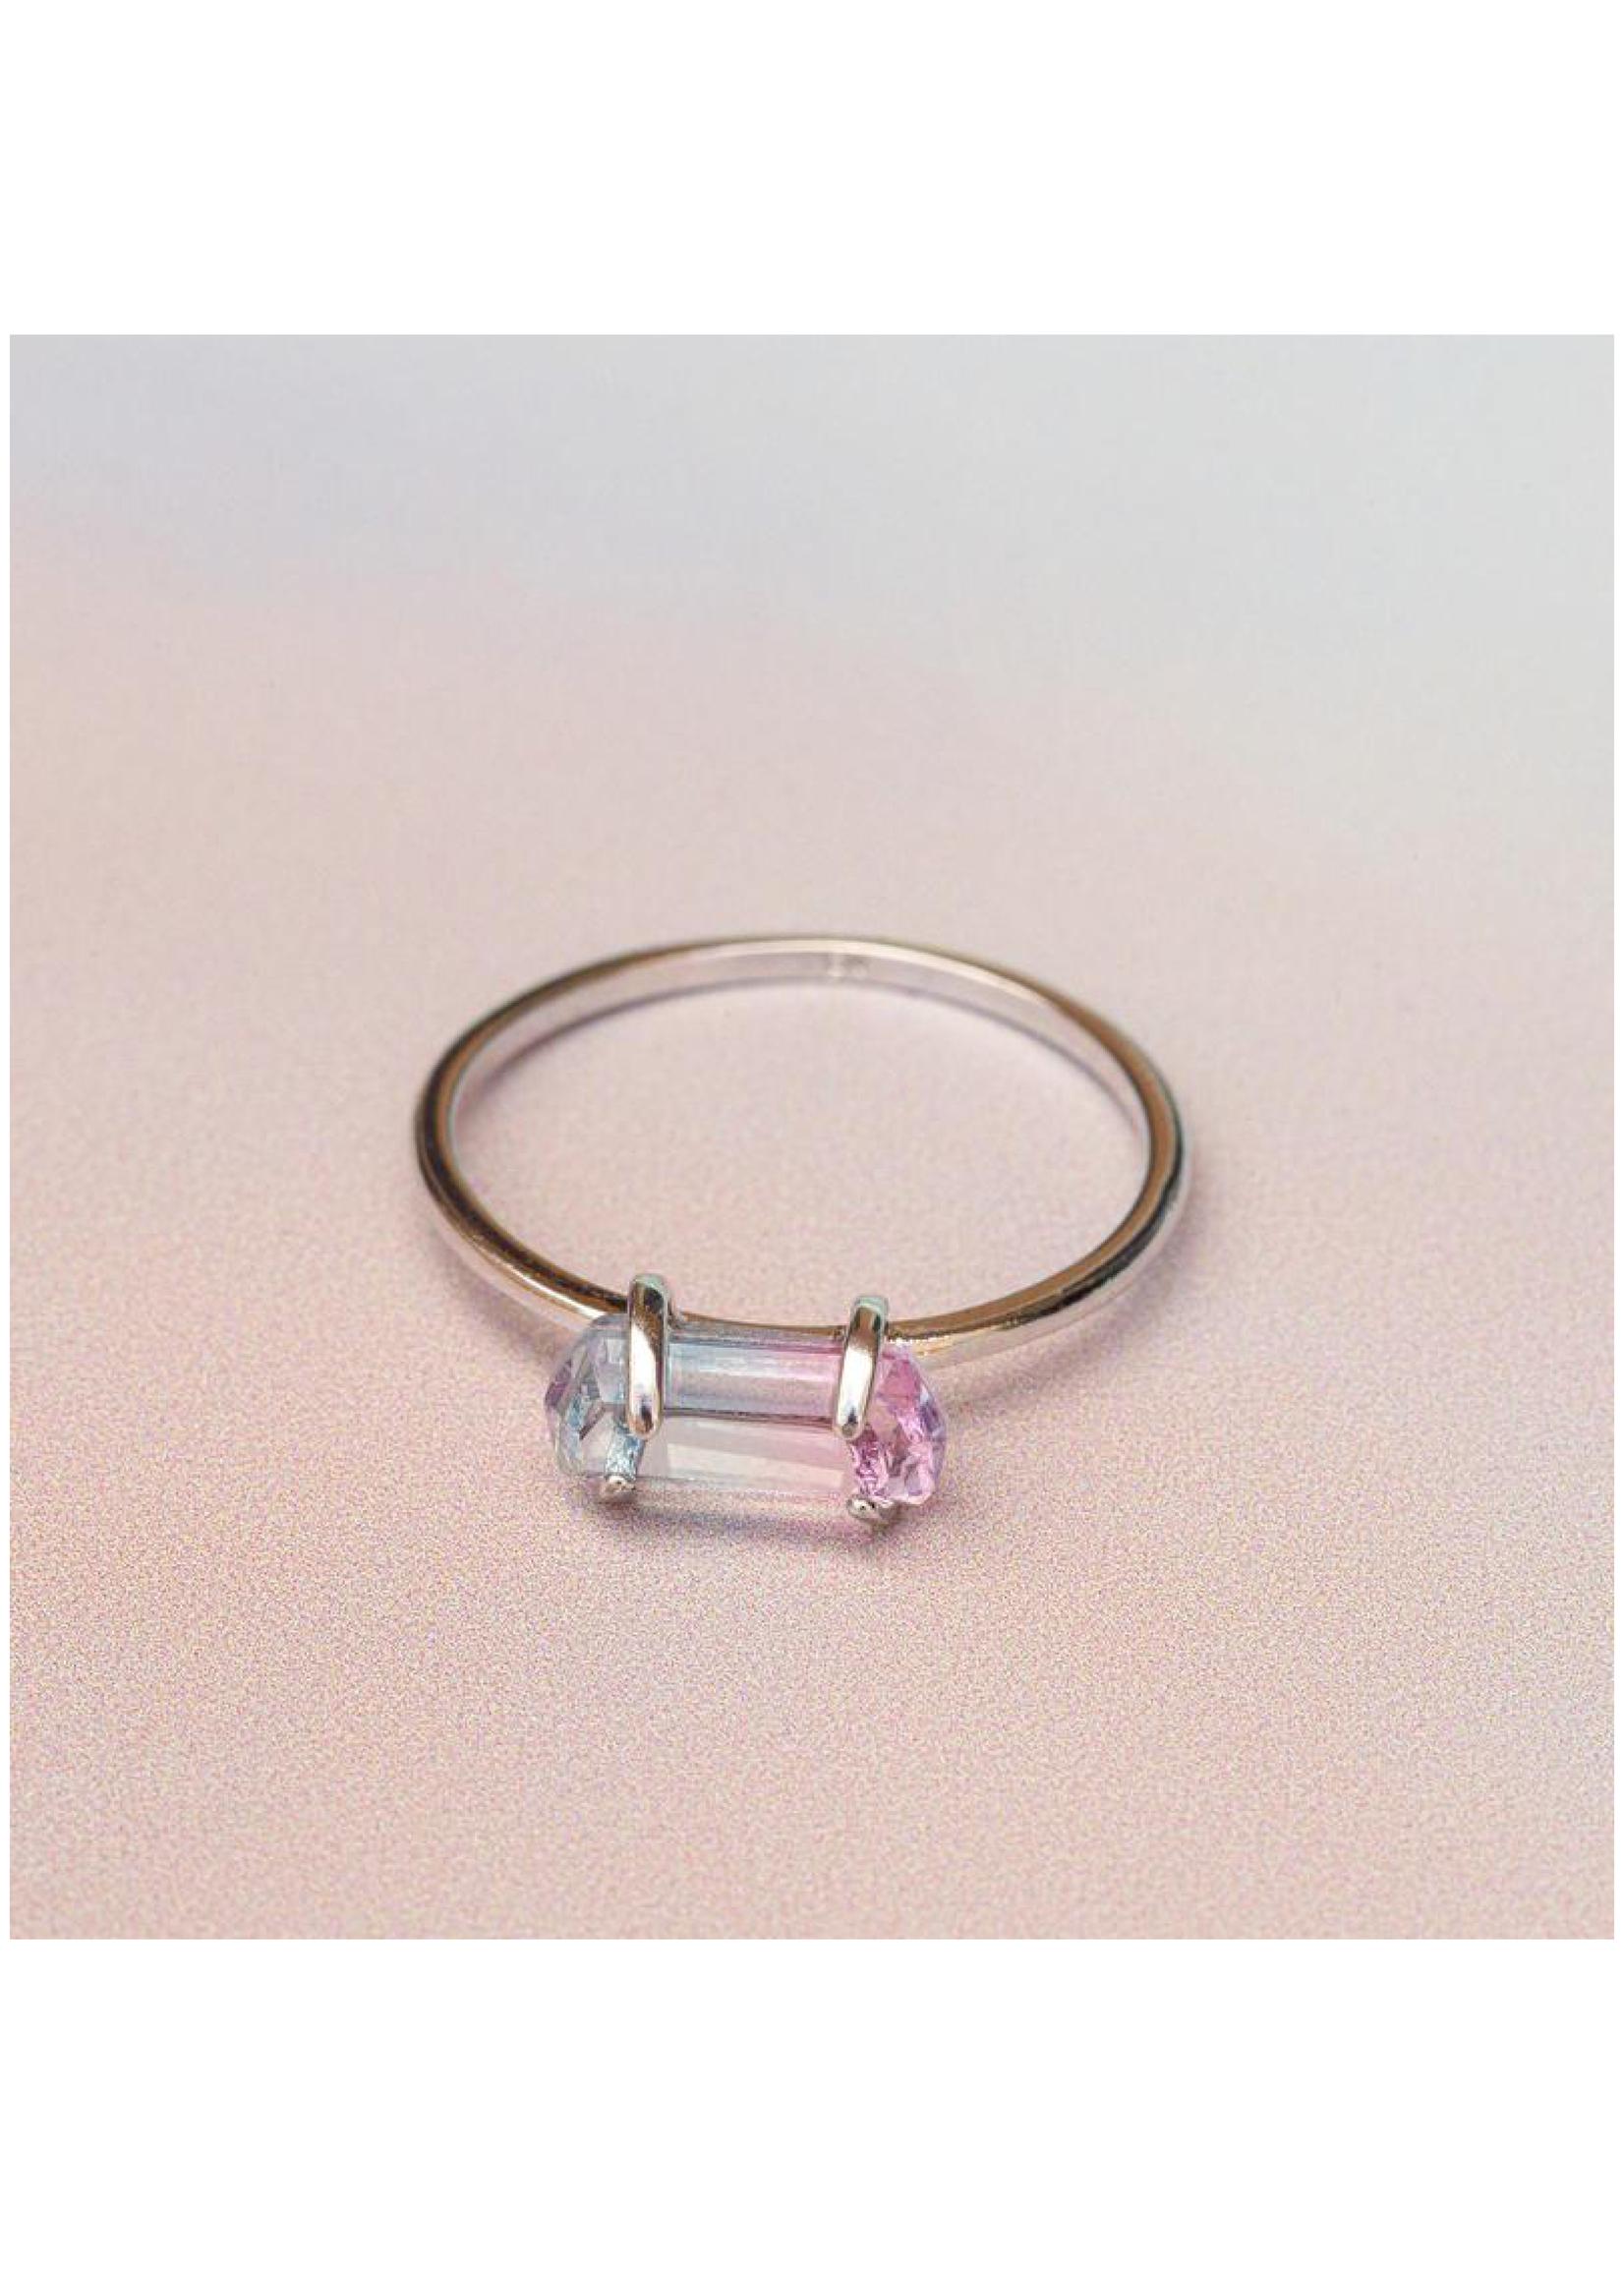 puravida bracelets Mermaid Quartz Ring Silver